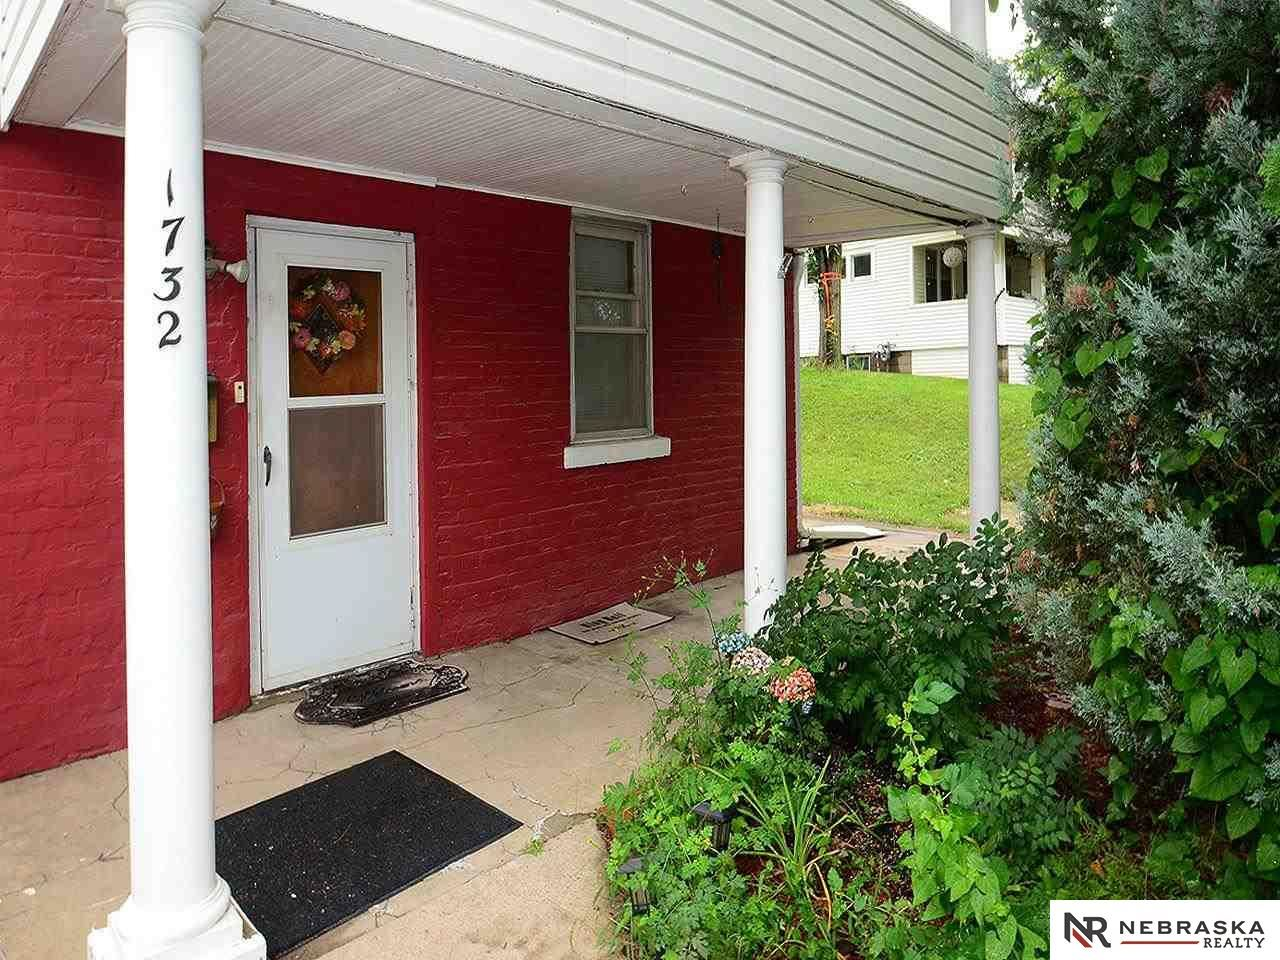 1732 S 14th Street, Omaha, NE 68108 - MLS#: 22121084